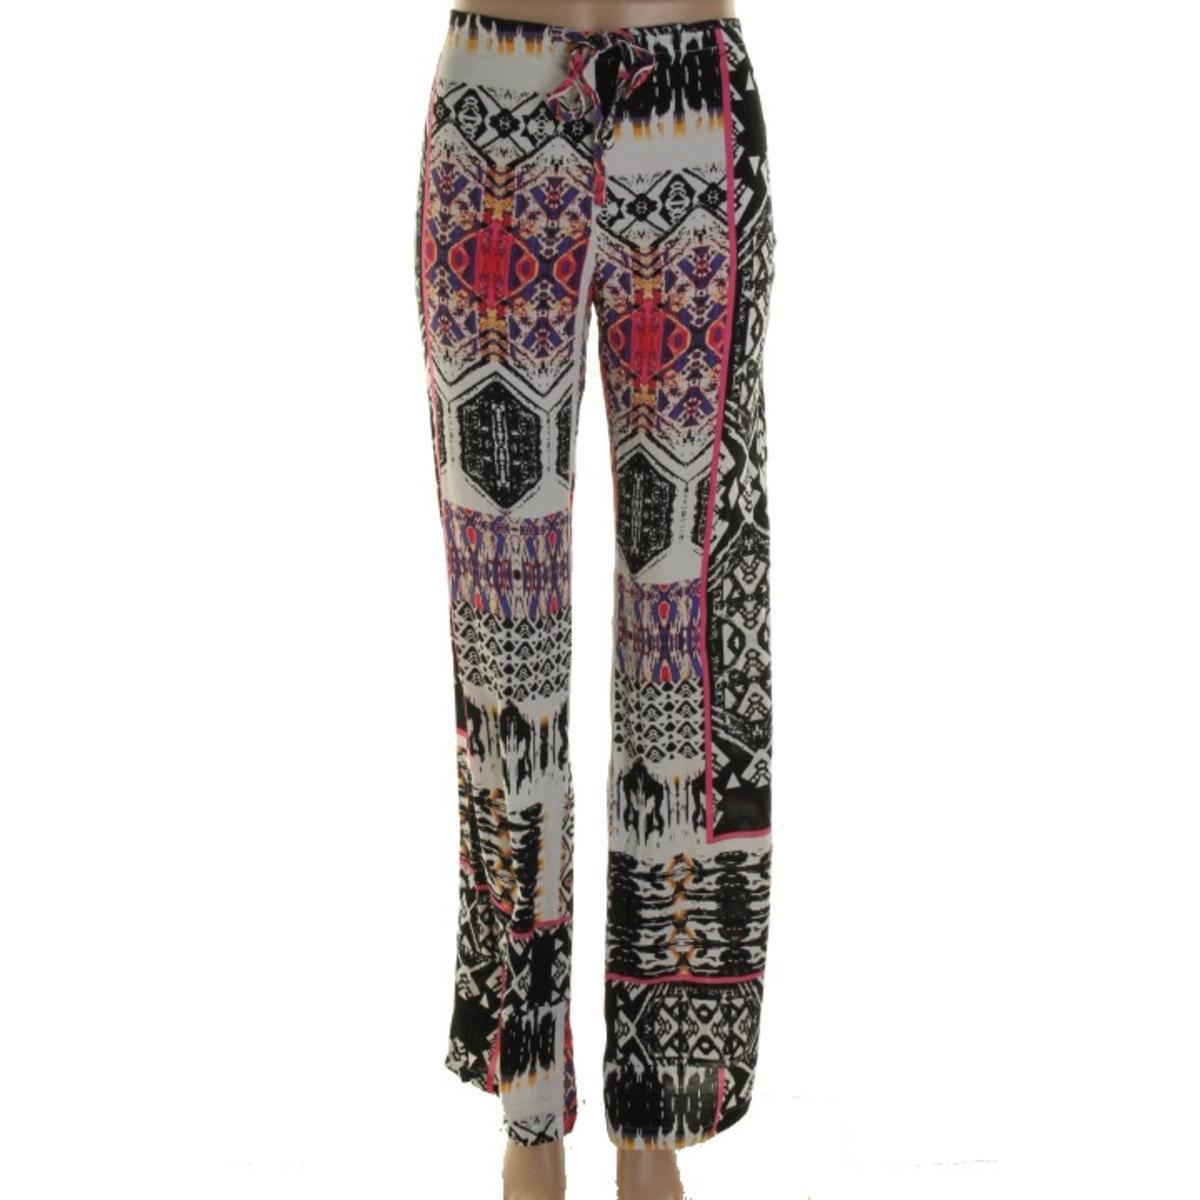 Elegant Sexy Fashion Lady Pattern Printed Hot Womens Stretch Tight Leggings Skinny Pants | EBay